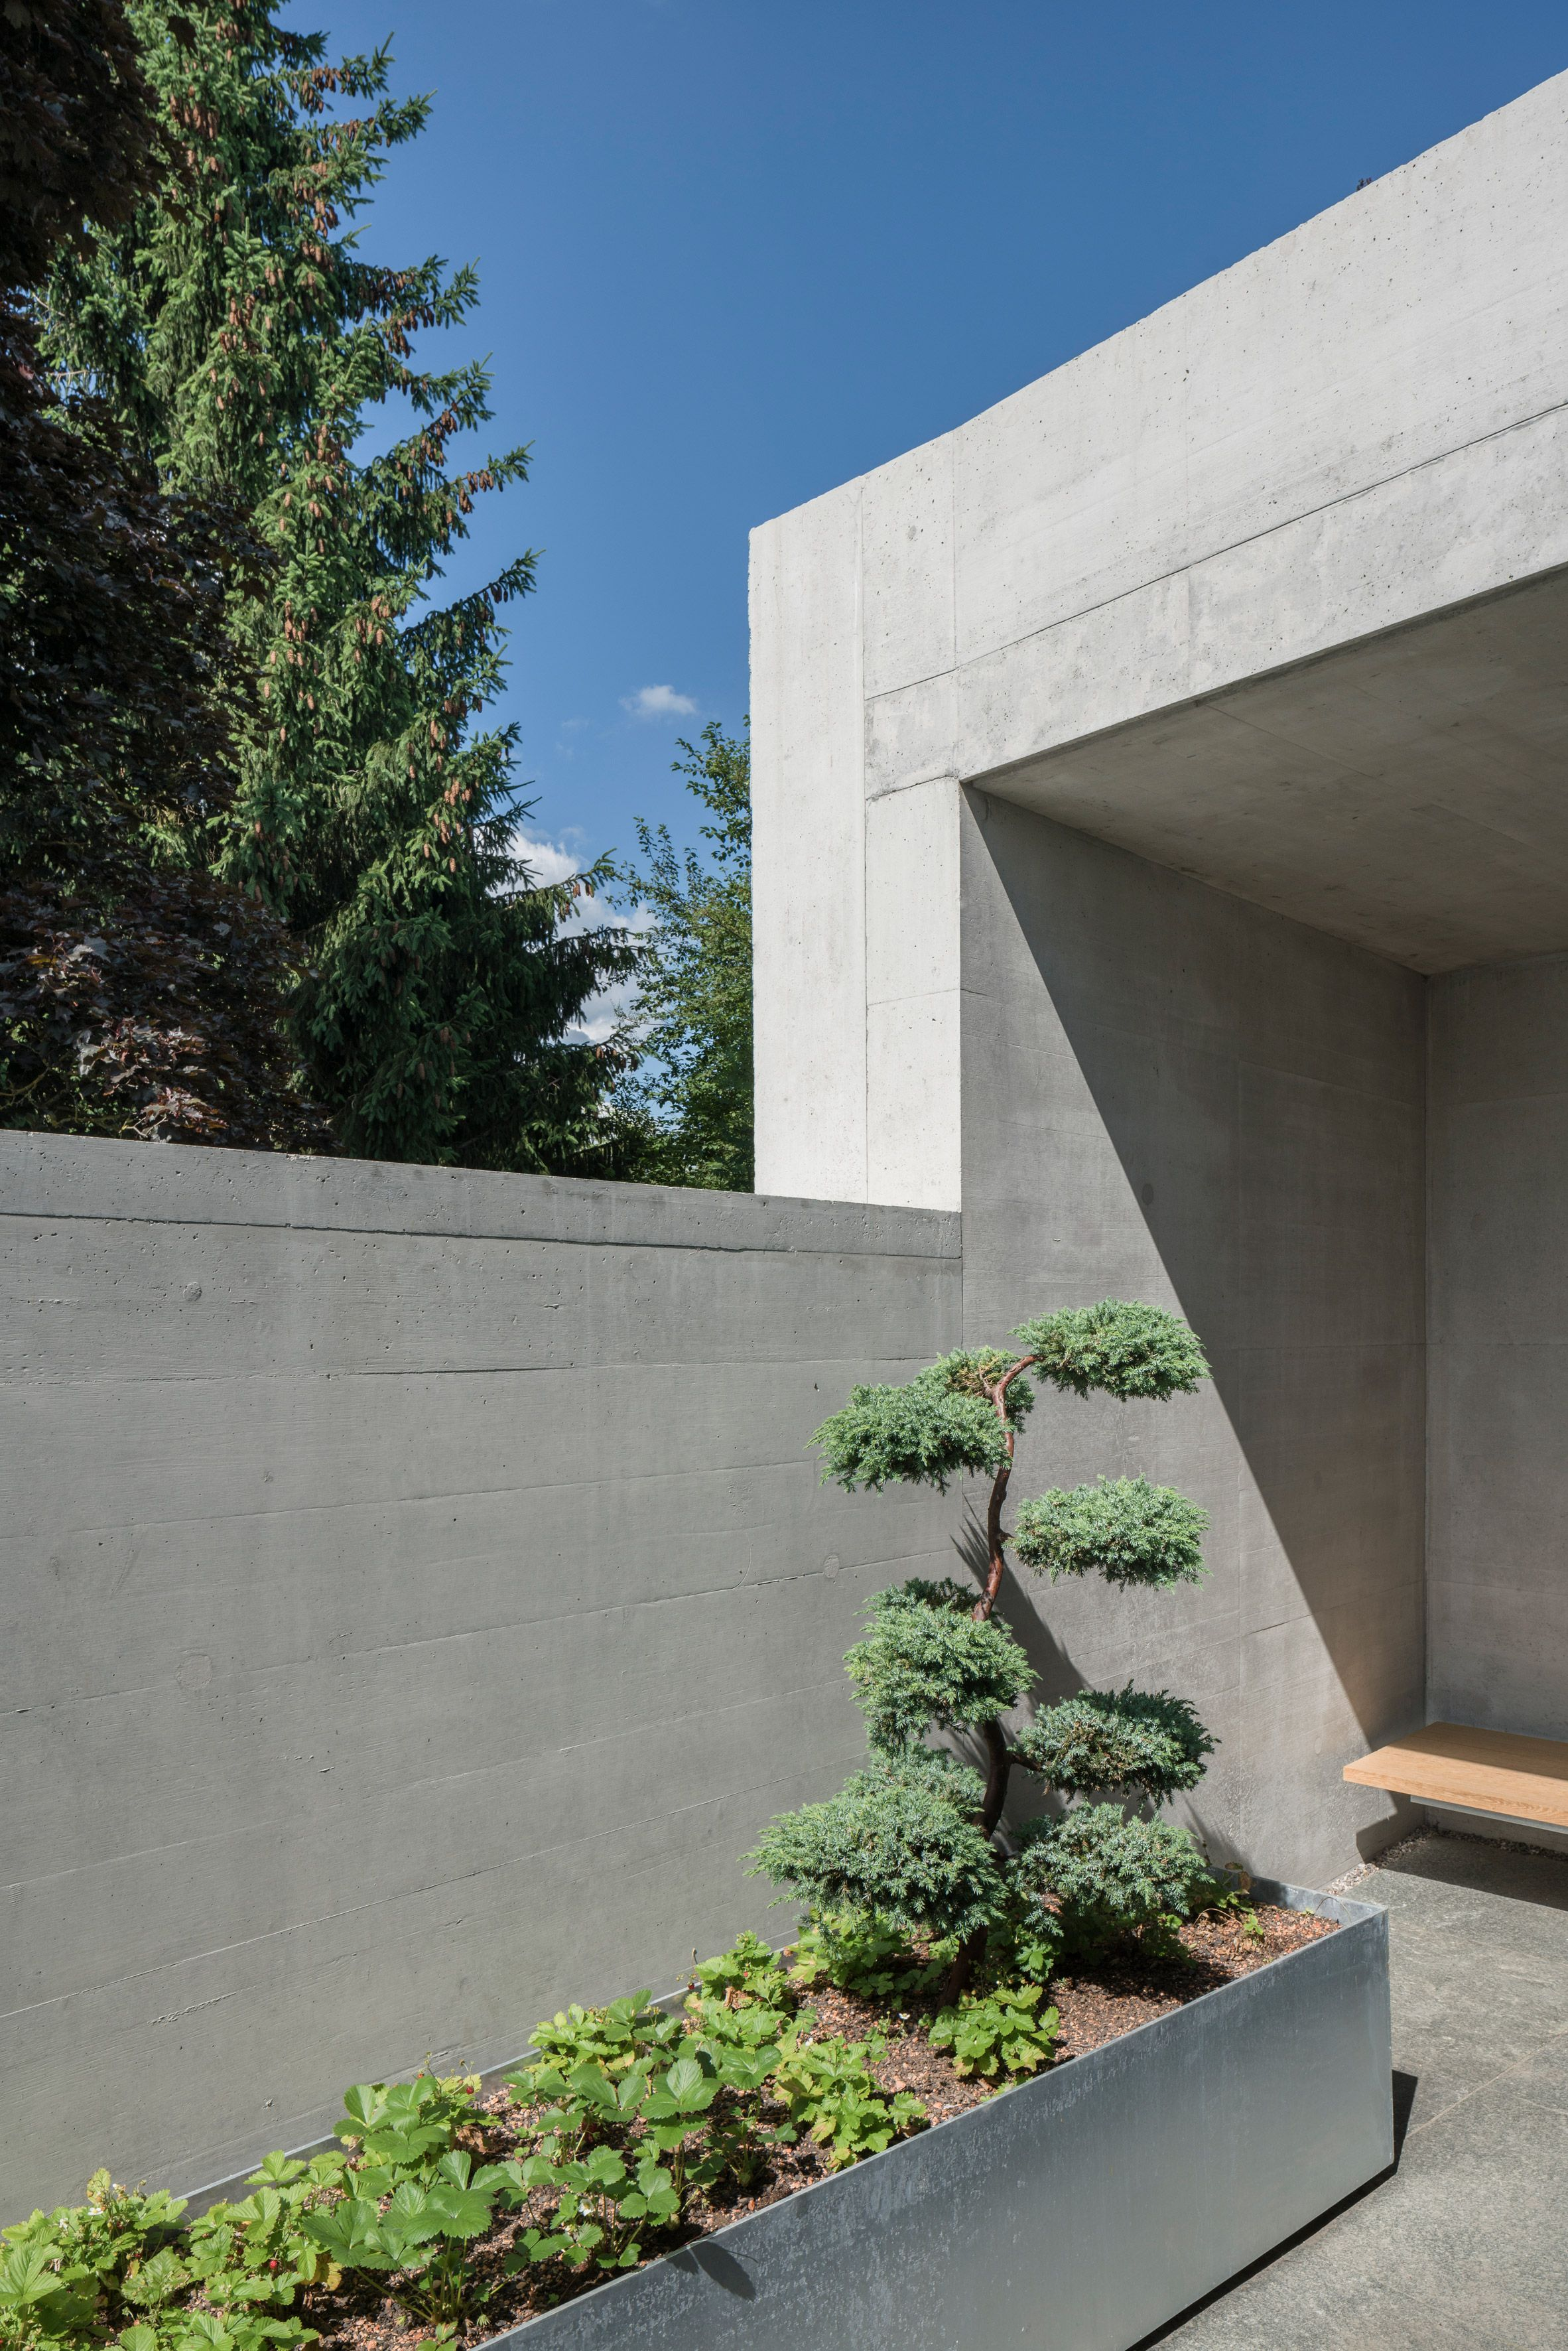 Raw Concrete Uf Haus In Bavaria Cantilevers Over Outdoor Terrace Concrete House Building Development Parking Design